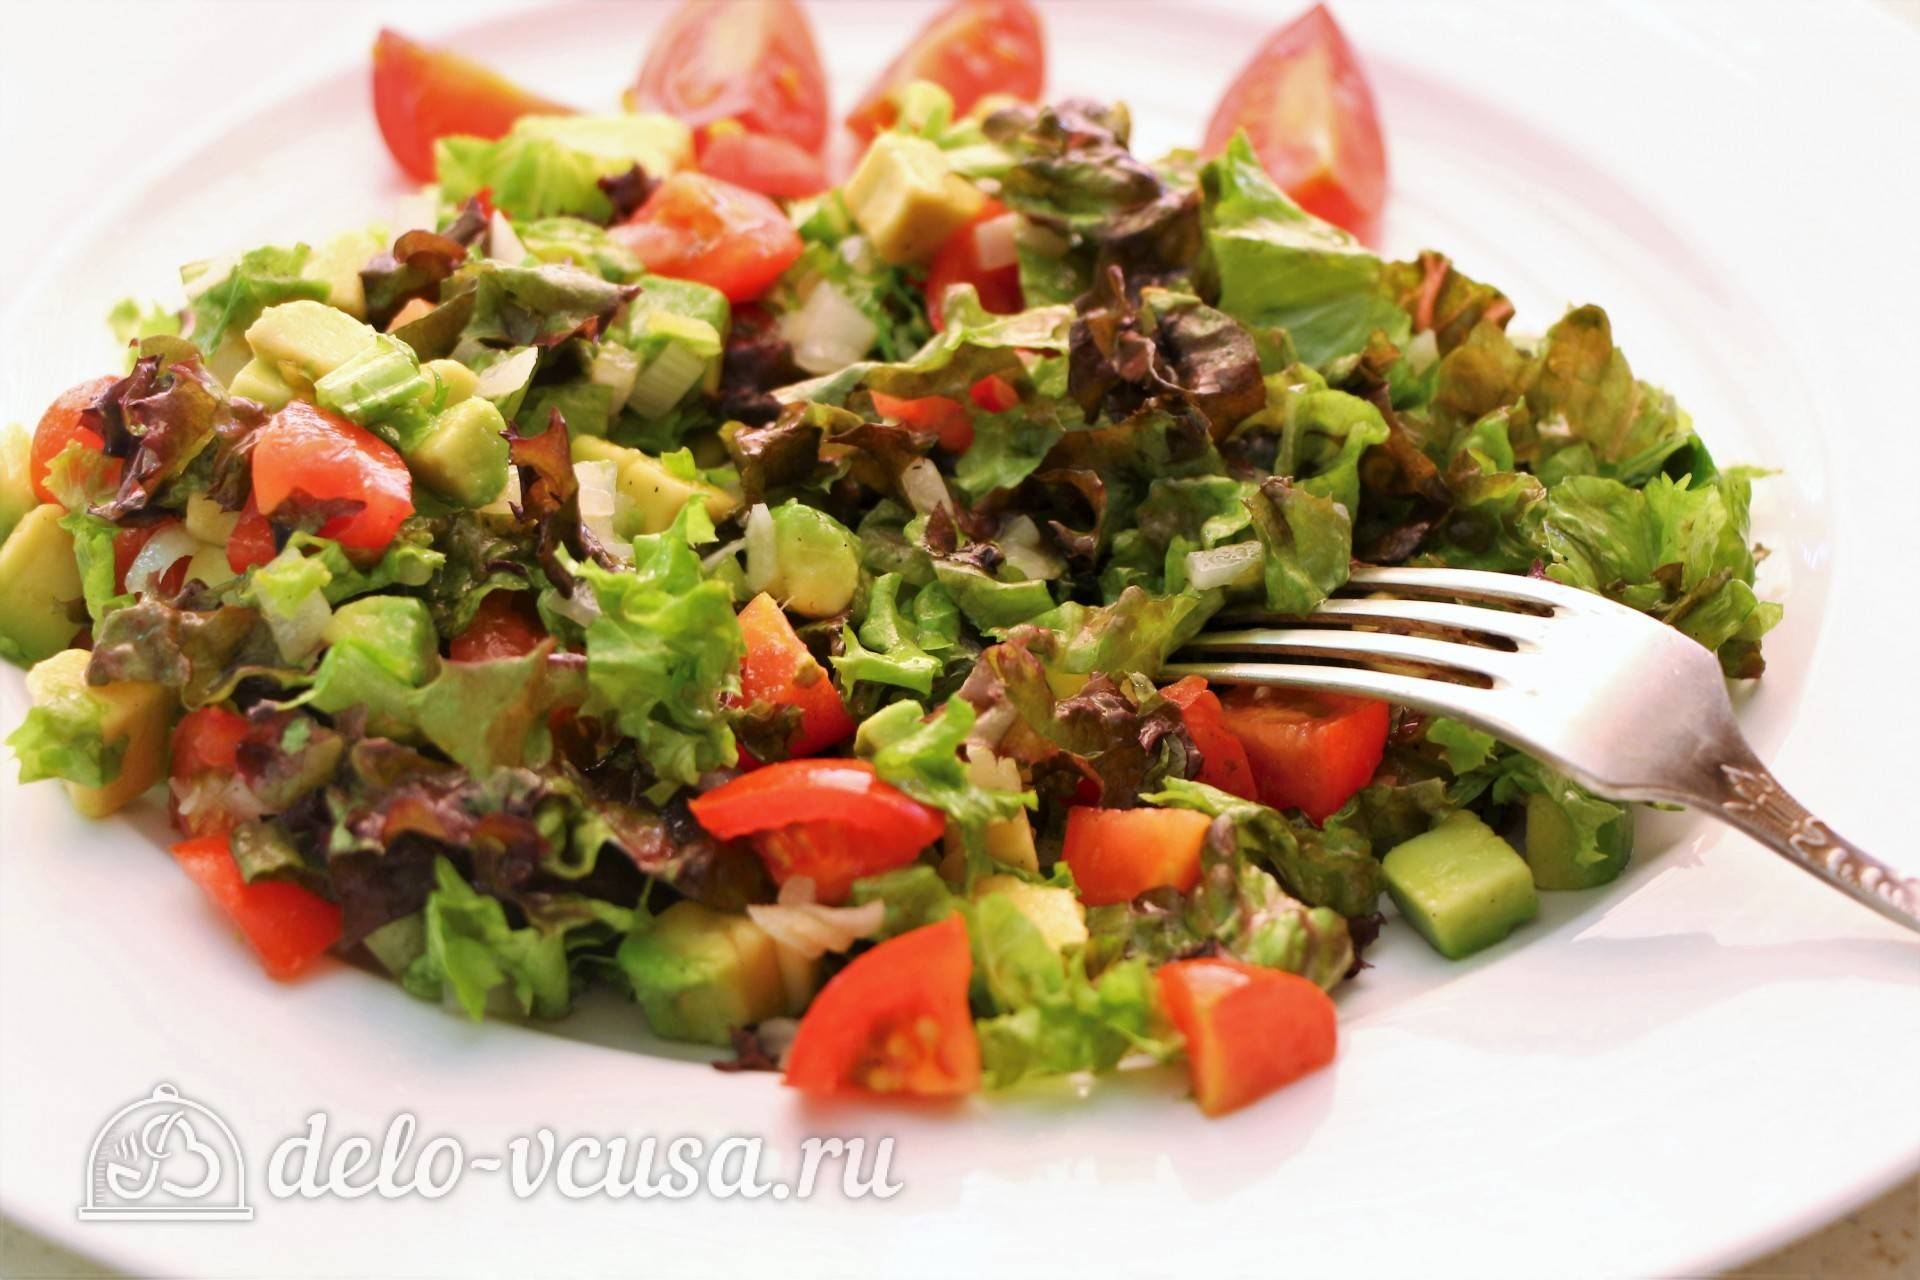 Салат из авокадо с креветками и томатами